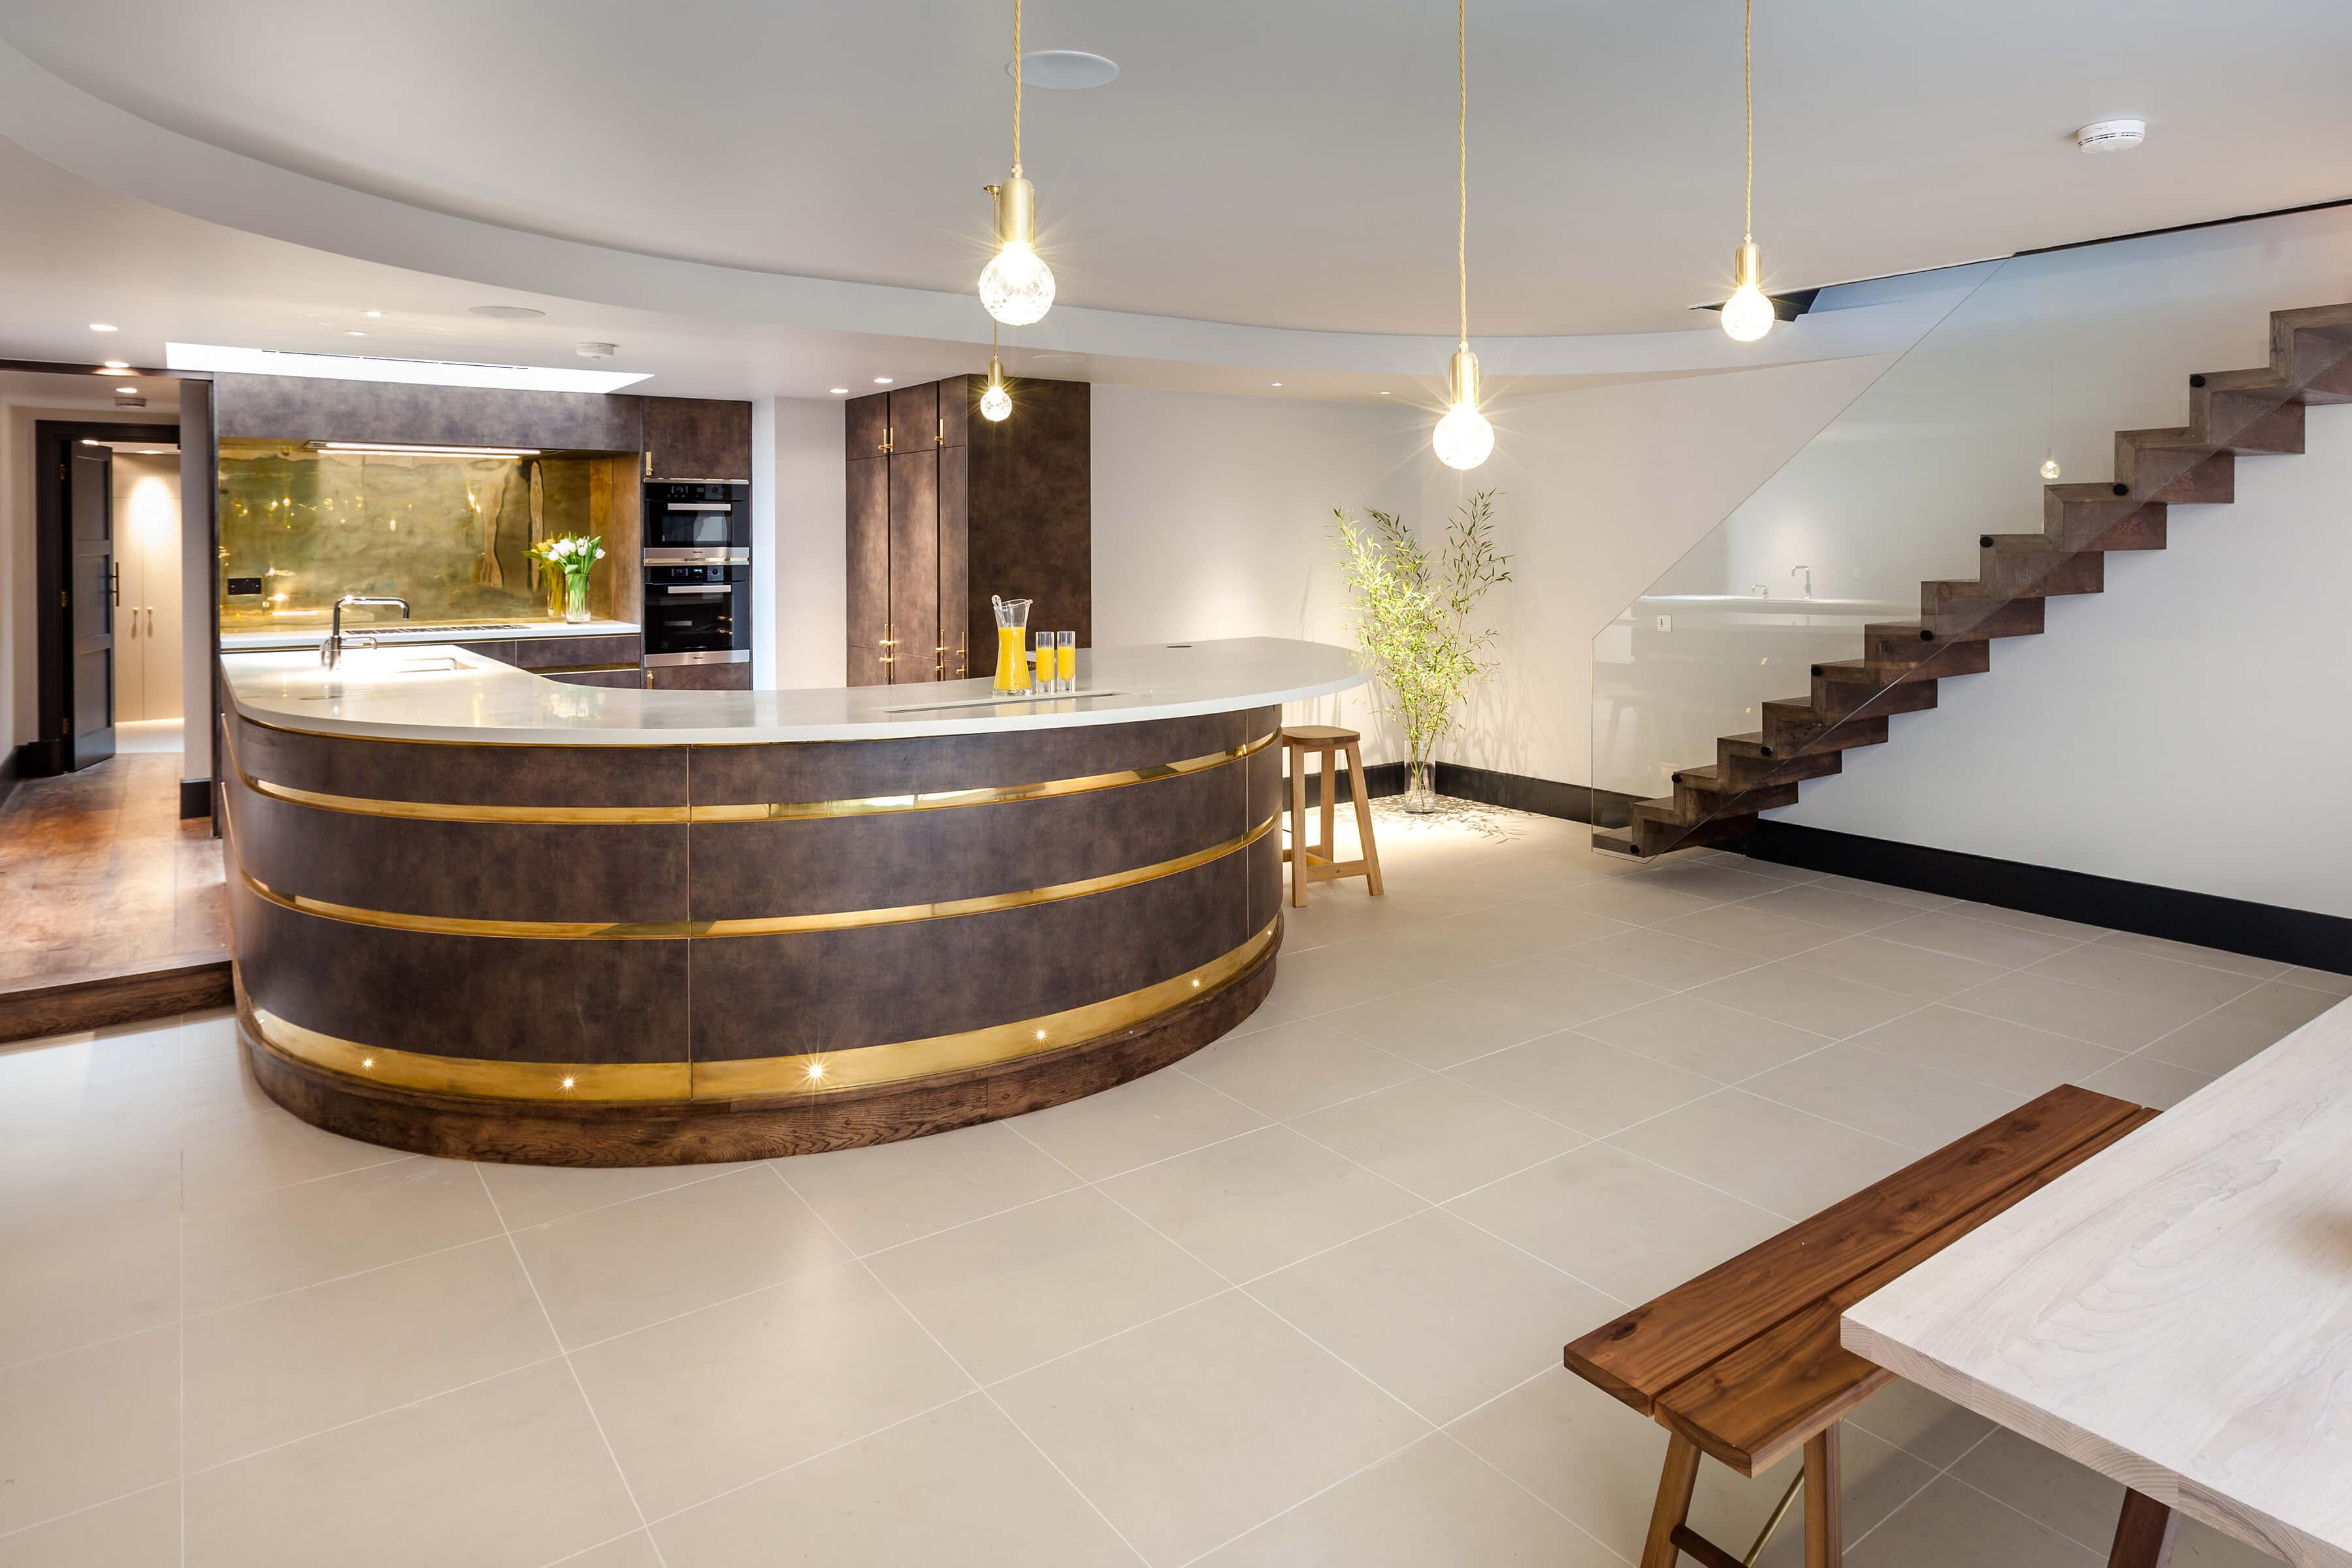 Basement kitchen with dark kitchen cabinetry and brass detail